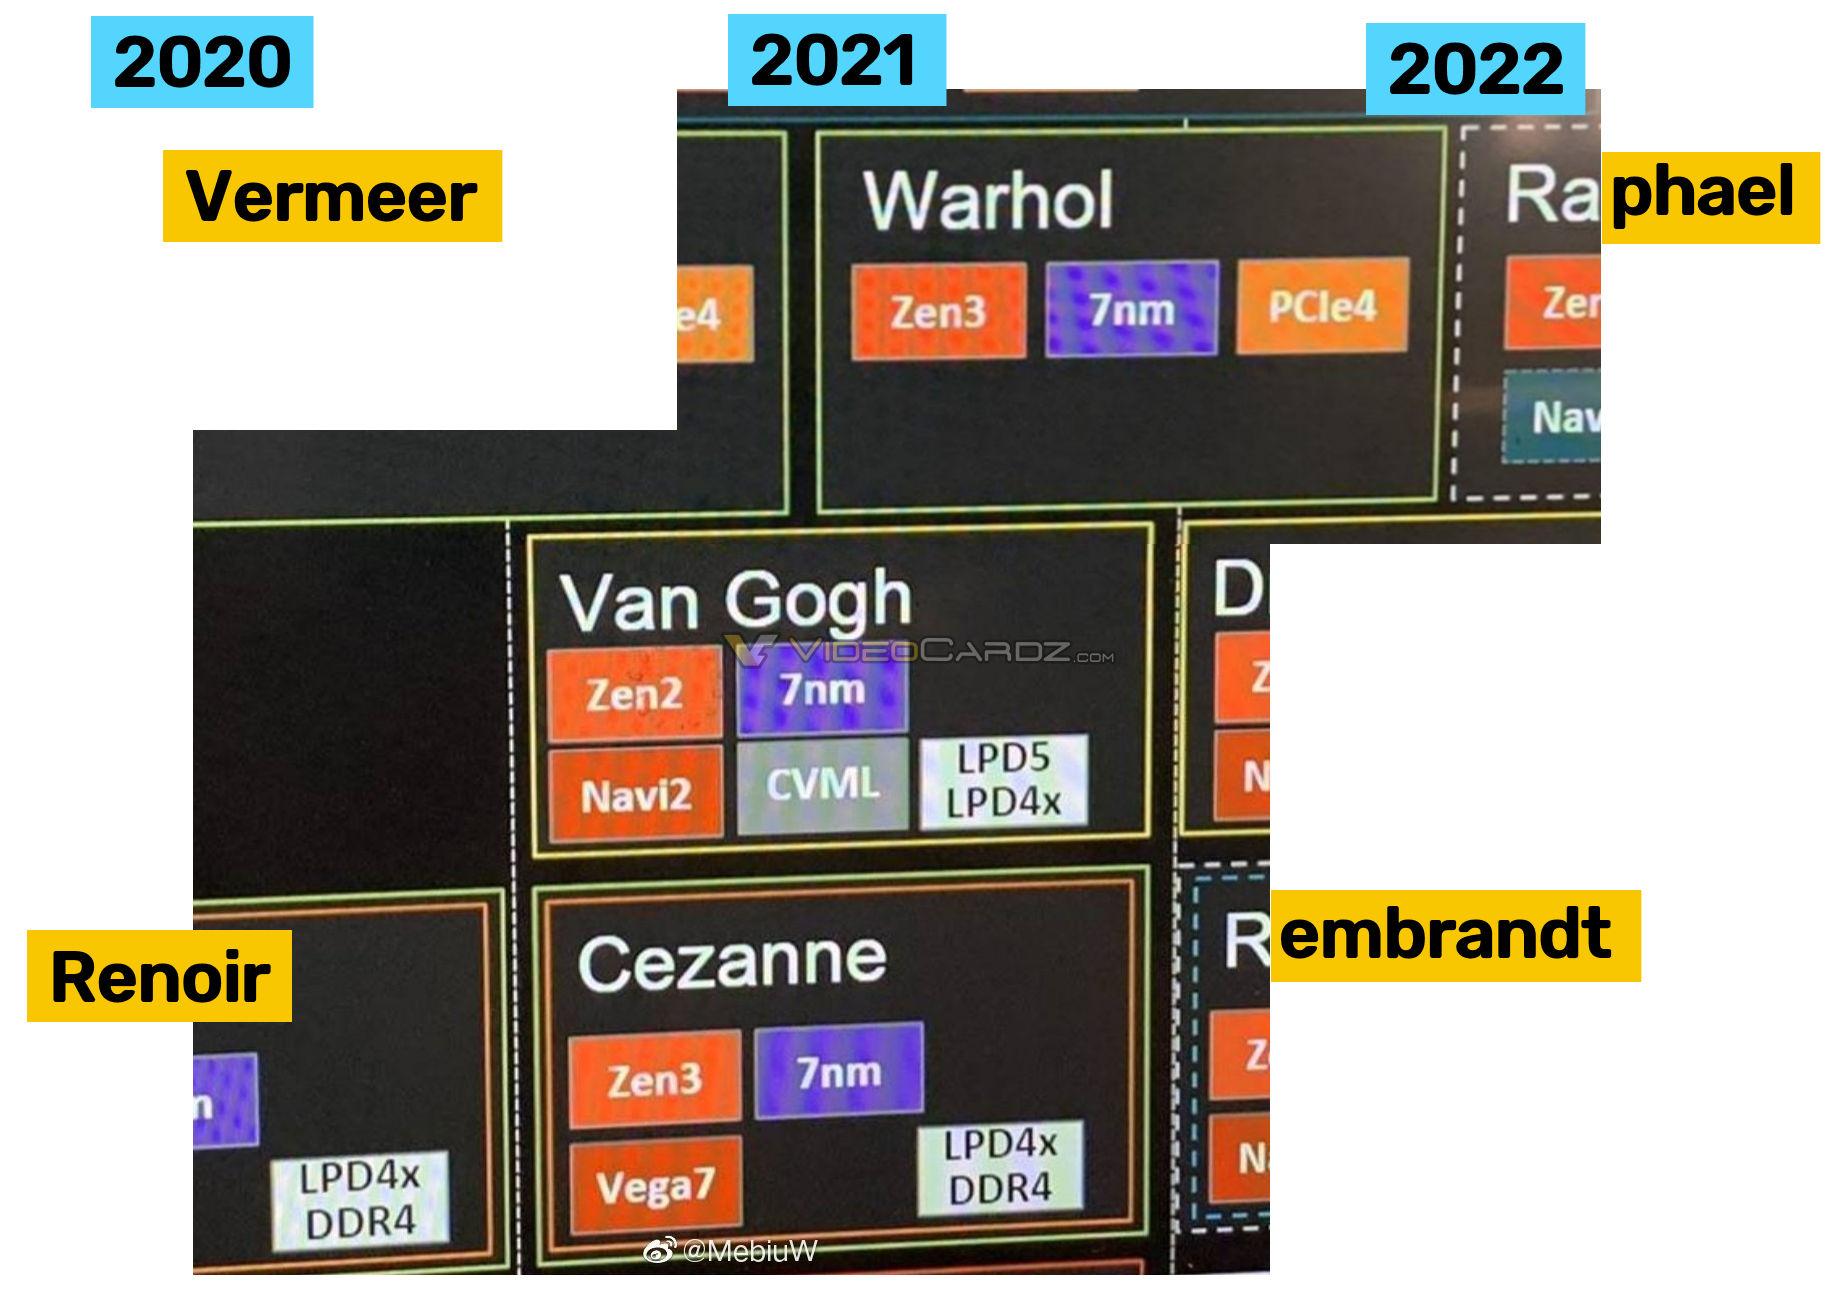 Amd S Ryzen Cpu Apu 2020 2022 Roadmap Leaks Out Next Gen Zen 2 Zen 3 Zen 4 Cpu Families Unveiled